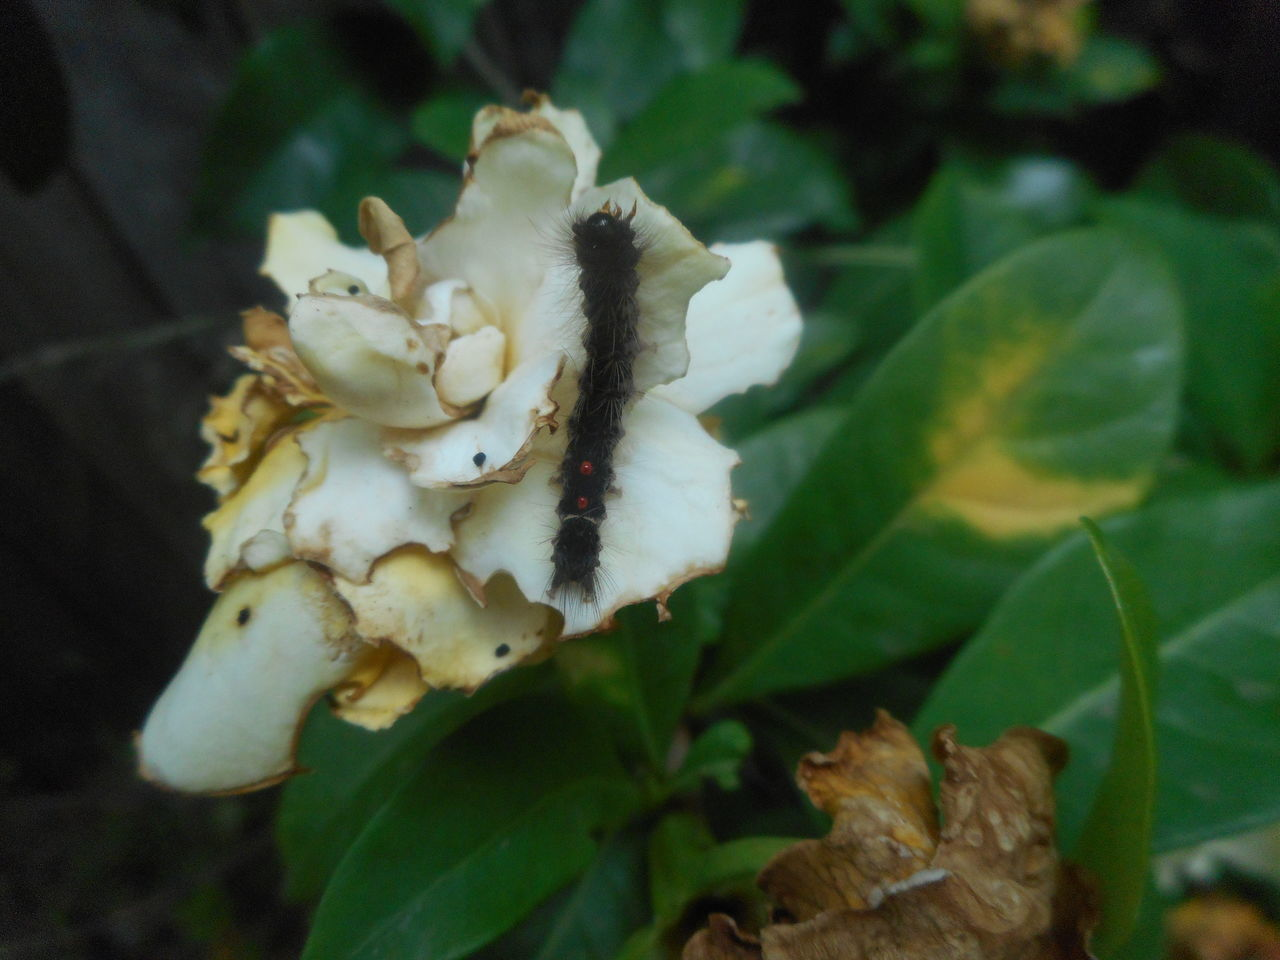 Australia Beauty In Nature Blooming Caterpillar Flower Flower Head Fragility Garden Pest Gardenia Gardenia Flower Gardenias Hungry Caterpillar Leaf Nature Pests Plant Transformation